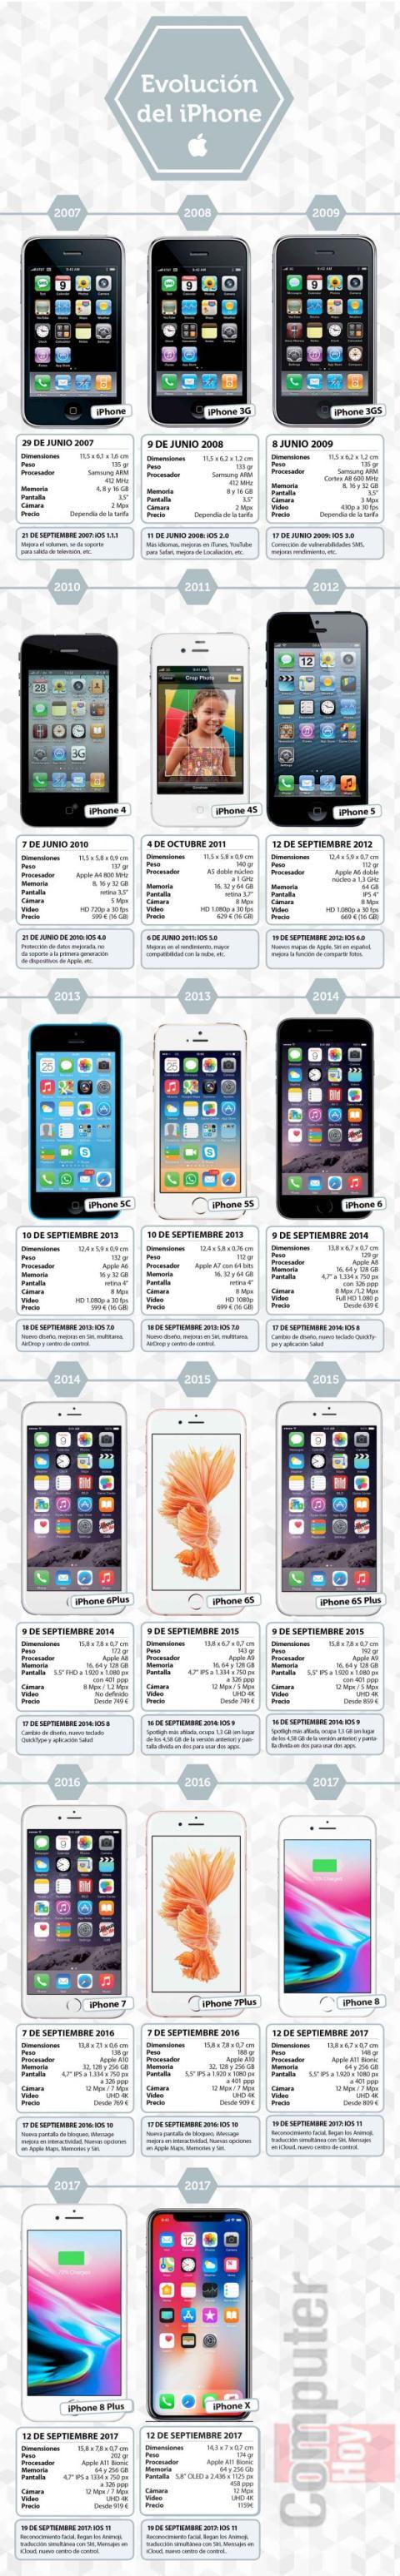 Dispositivos que se actualizarán a la iOS 11